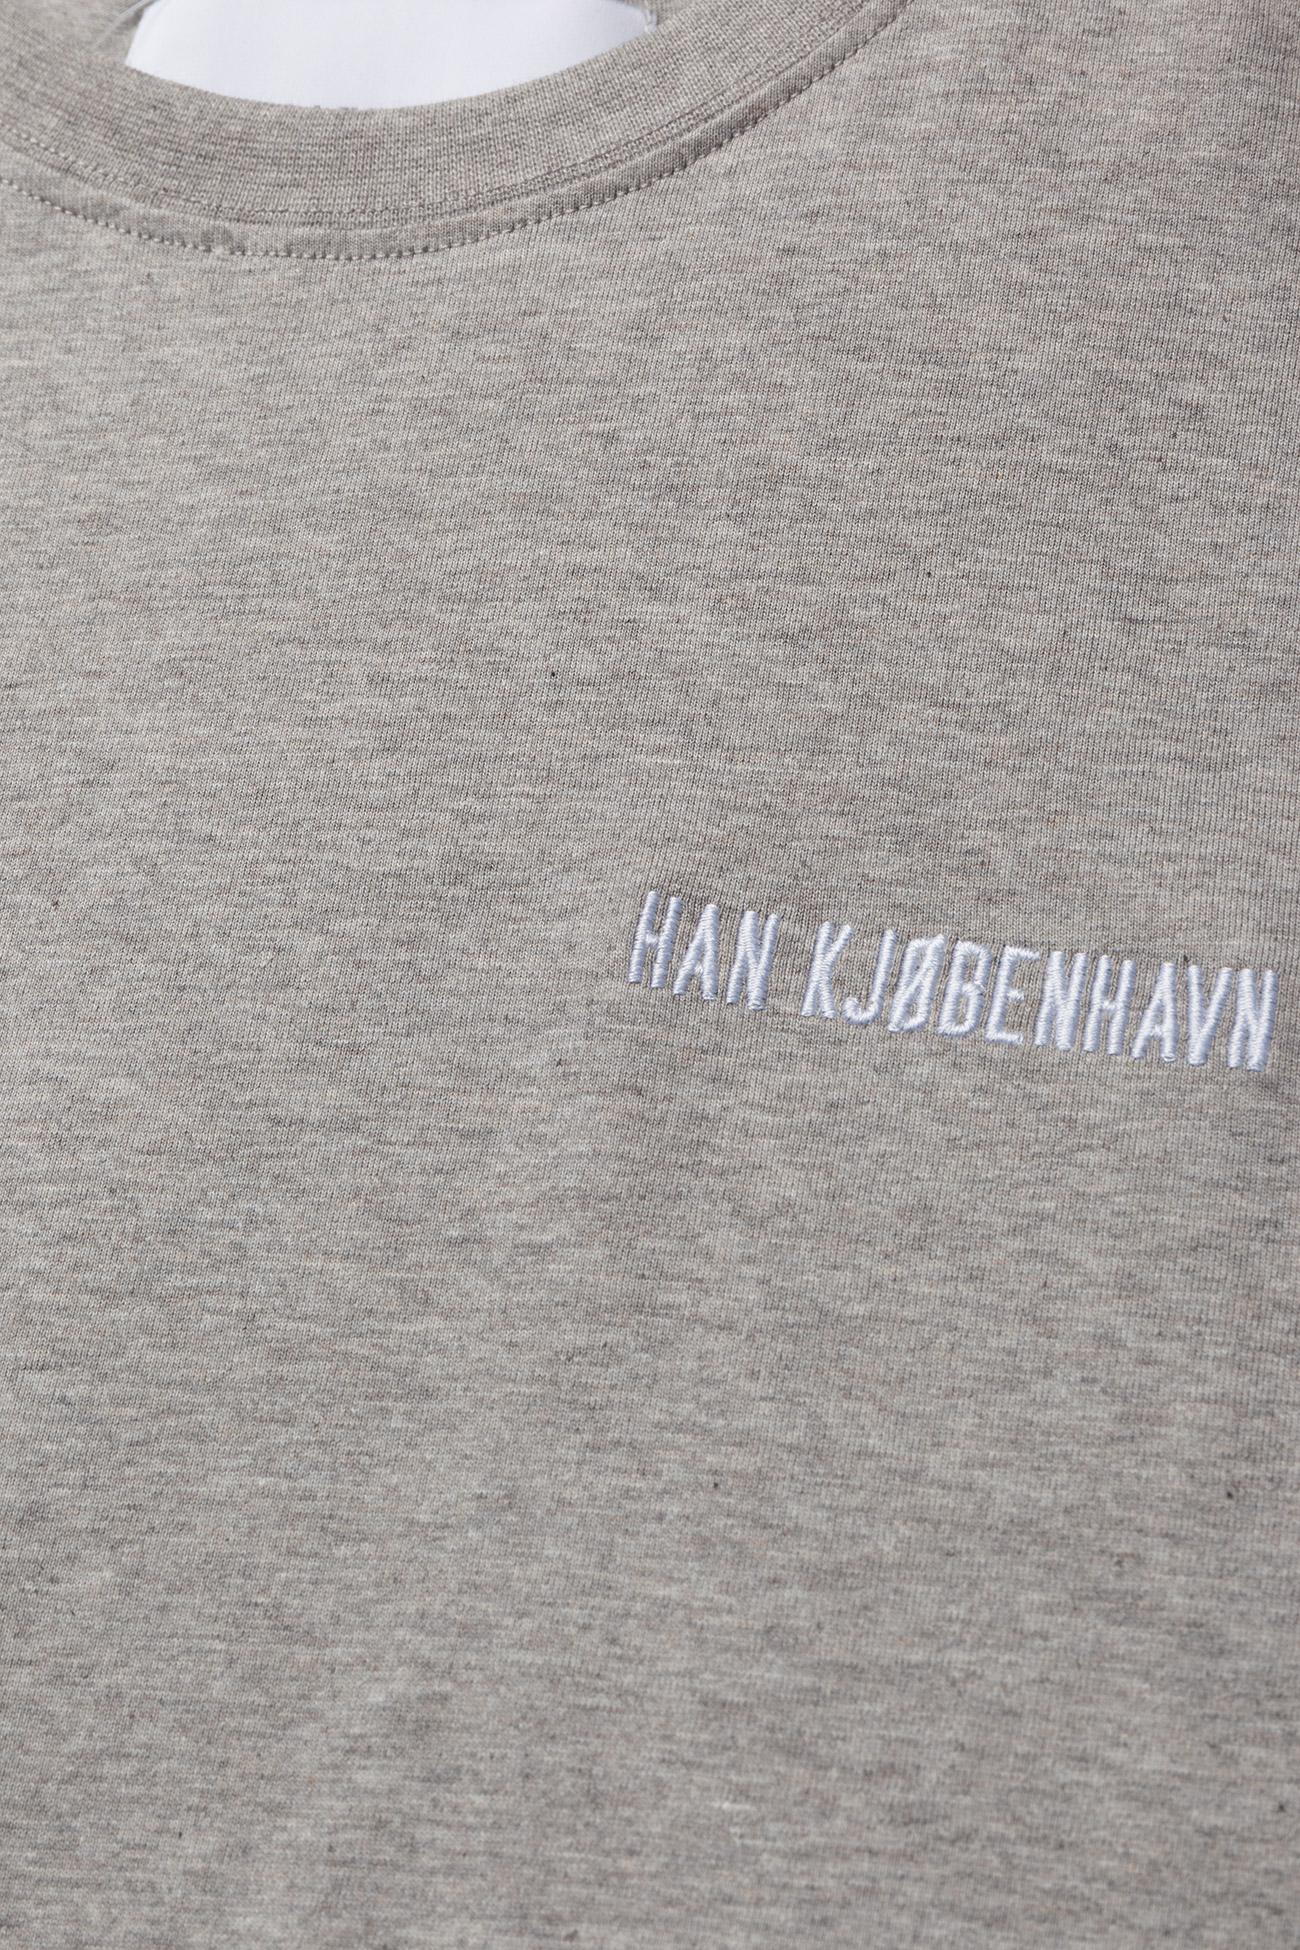 HAN Kjøbenhavn - Casual Tee - korte mouwen - grey melange - 3